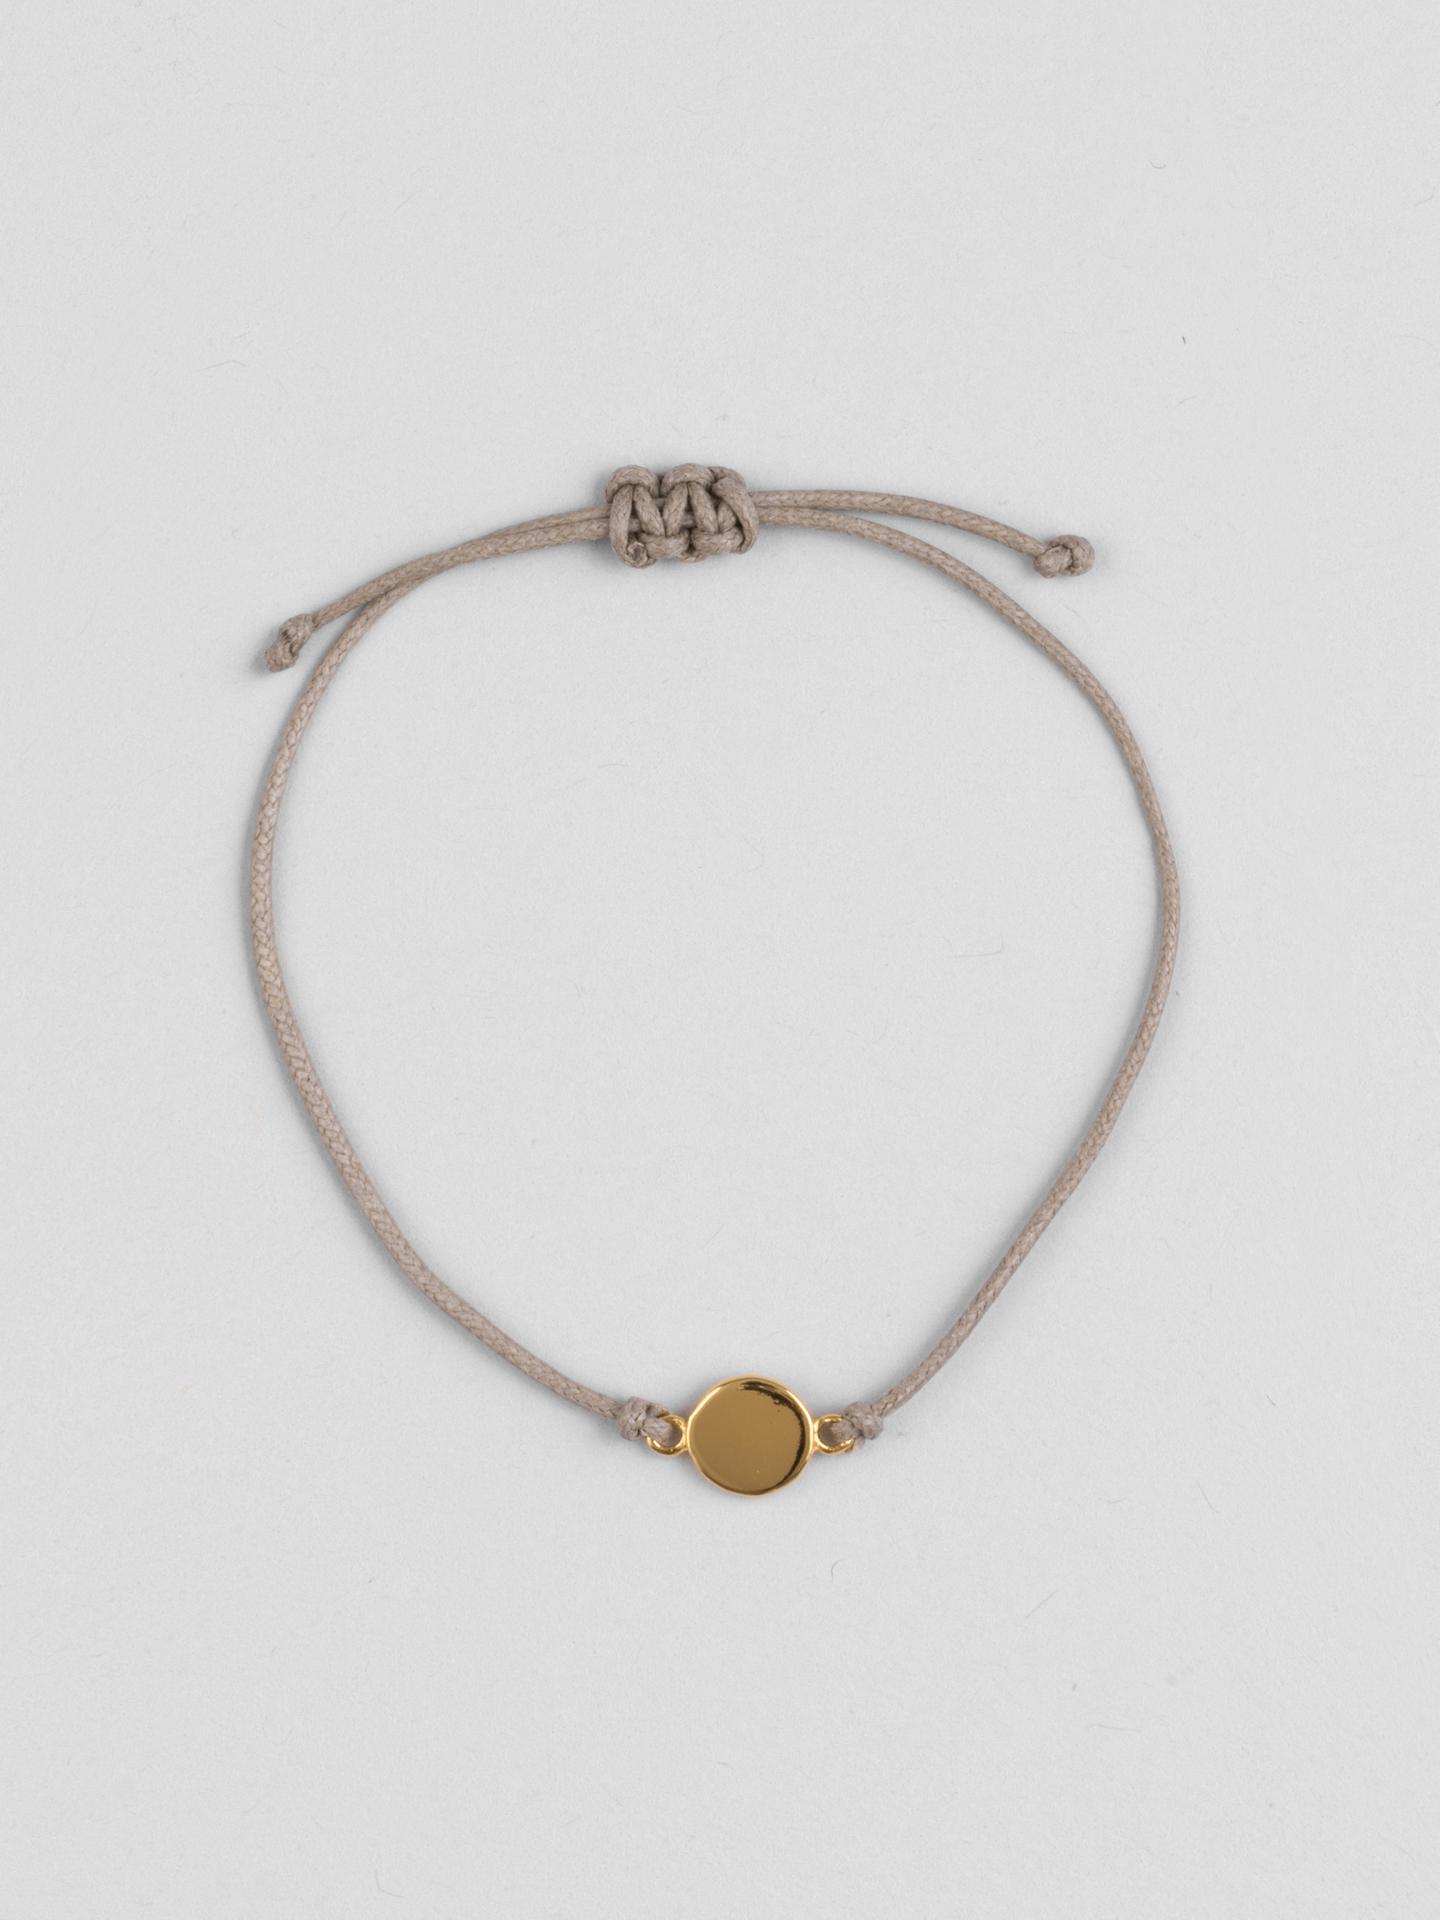 Round Engraving Braided Bracelet